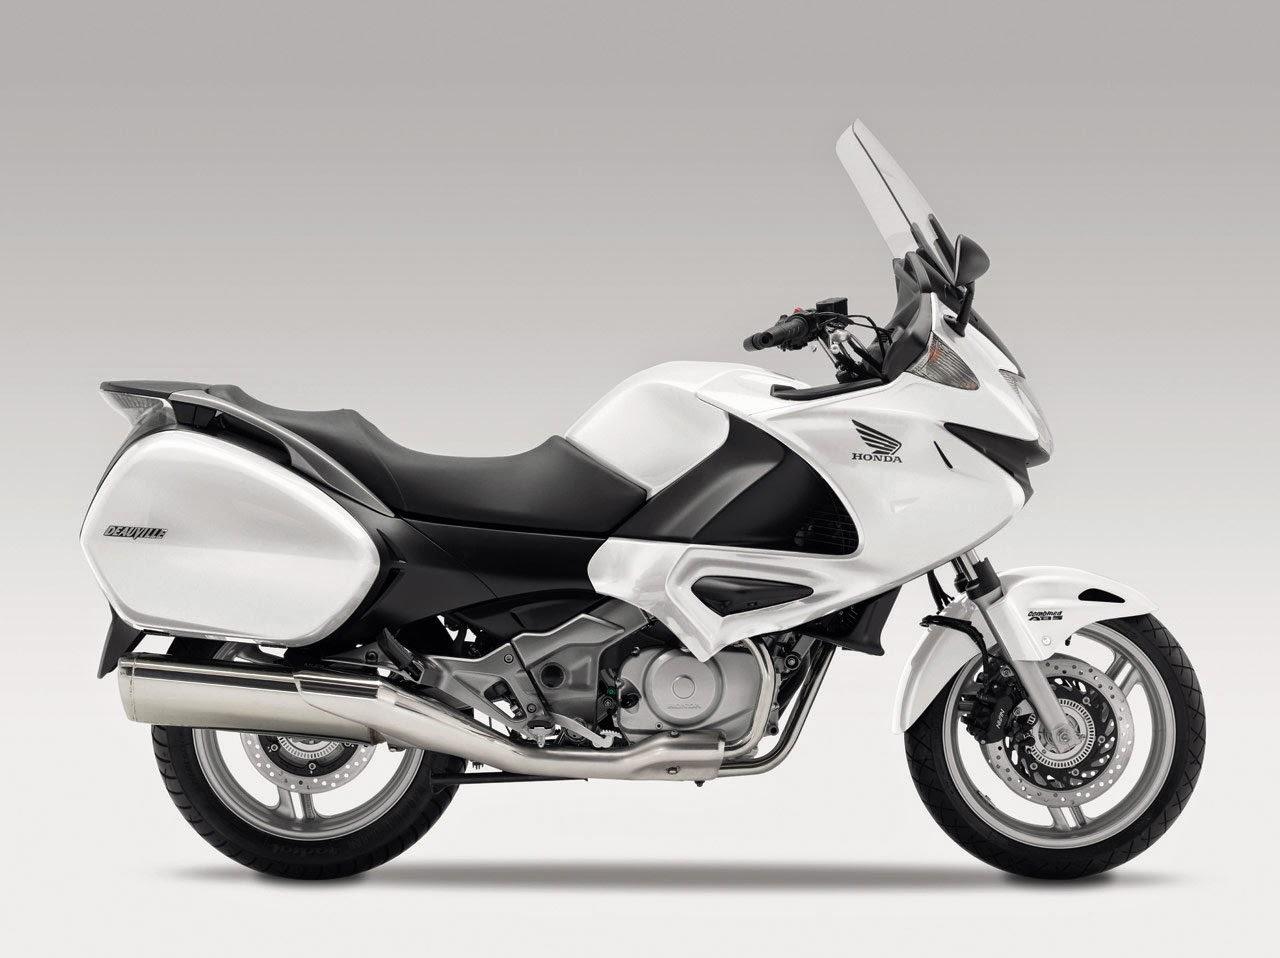 Honda Deauville Bike HD Images